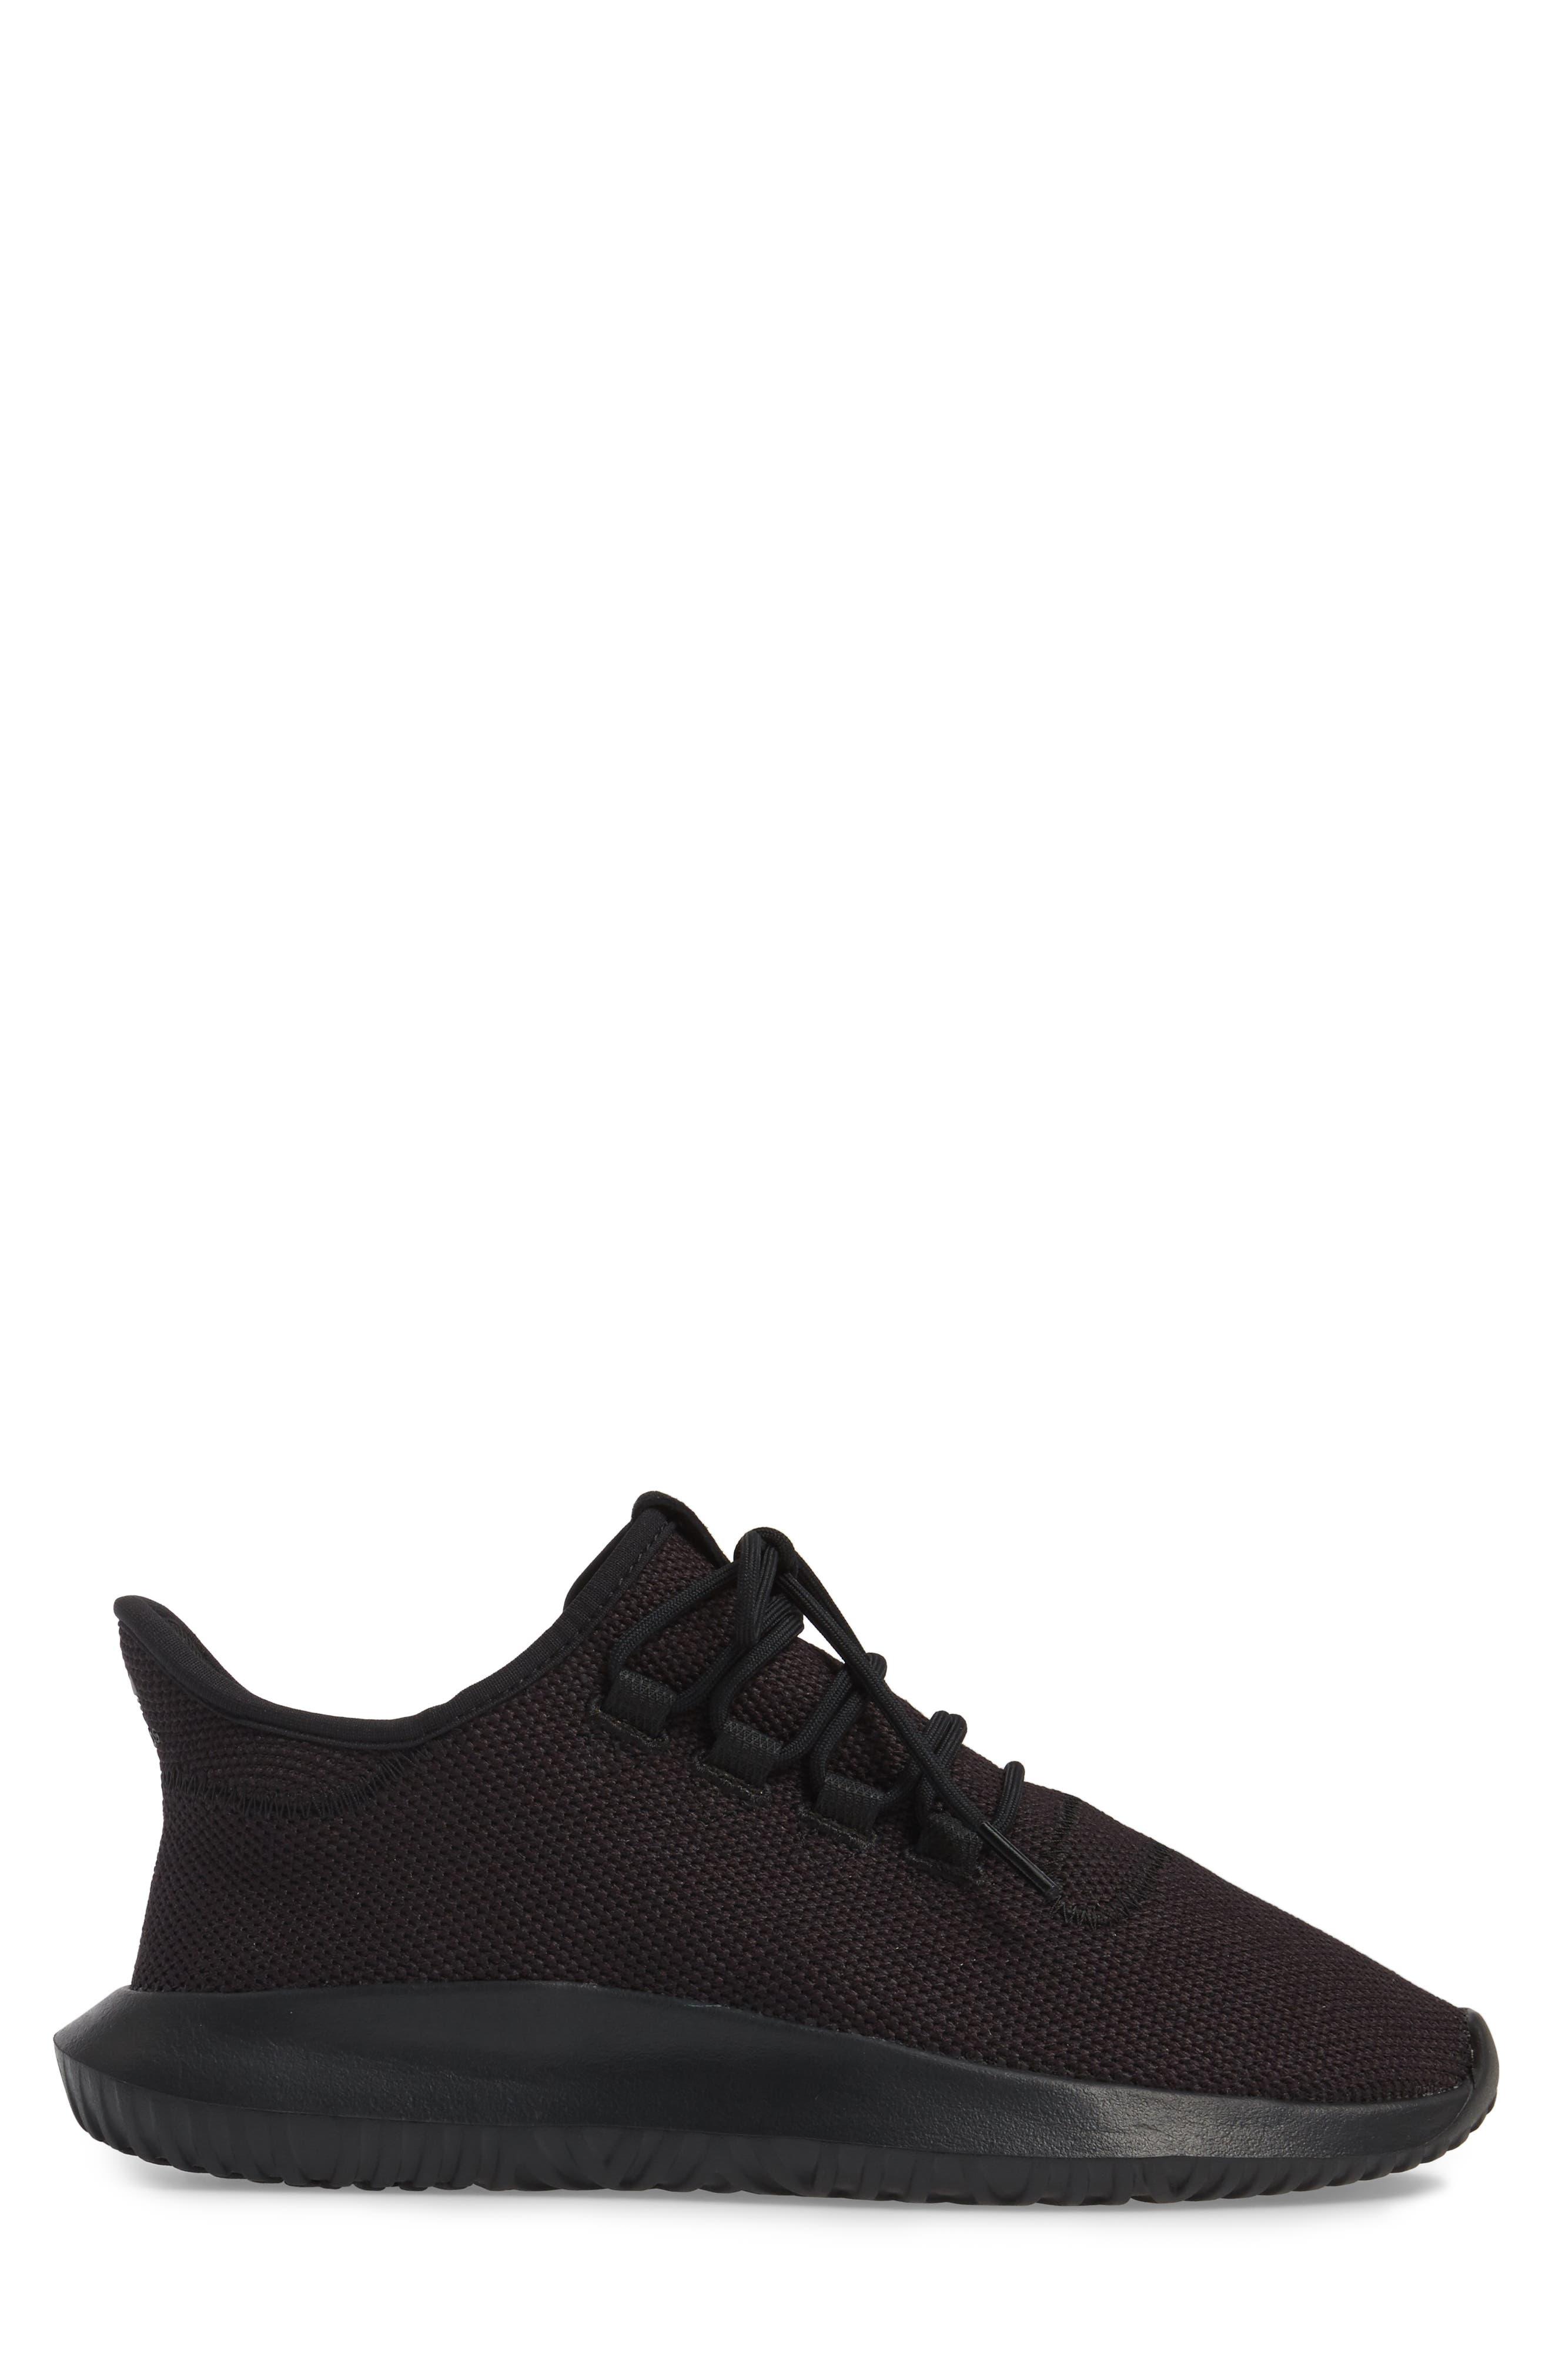 Tubular Shadow Sneaker,                             Alternate thumbnail 3, color,                             Core Black/ White/ Core Black